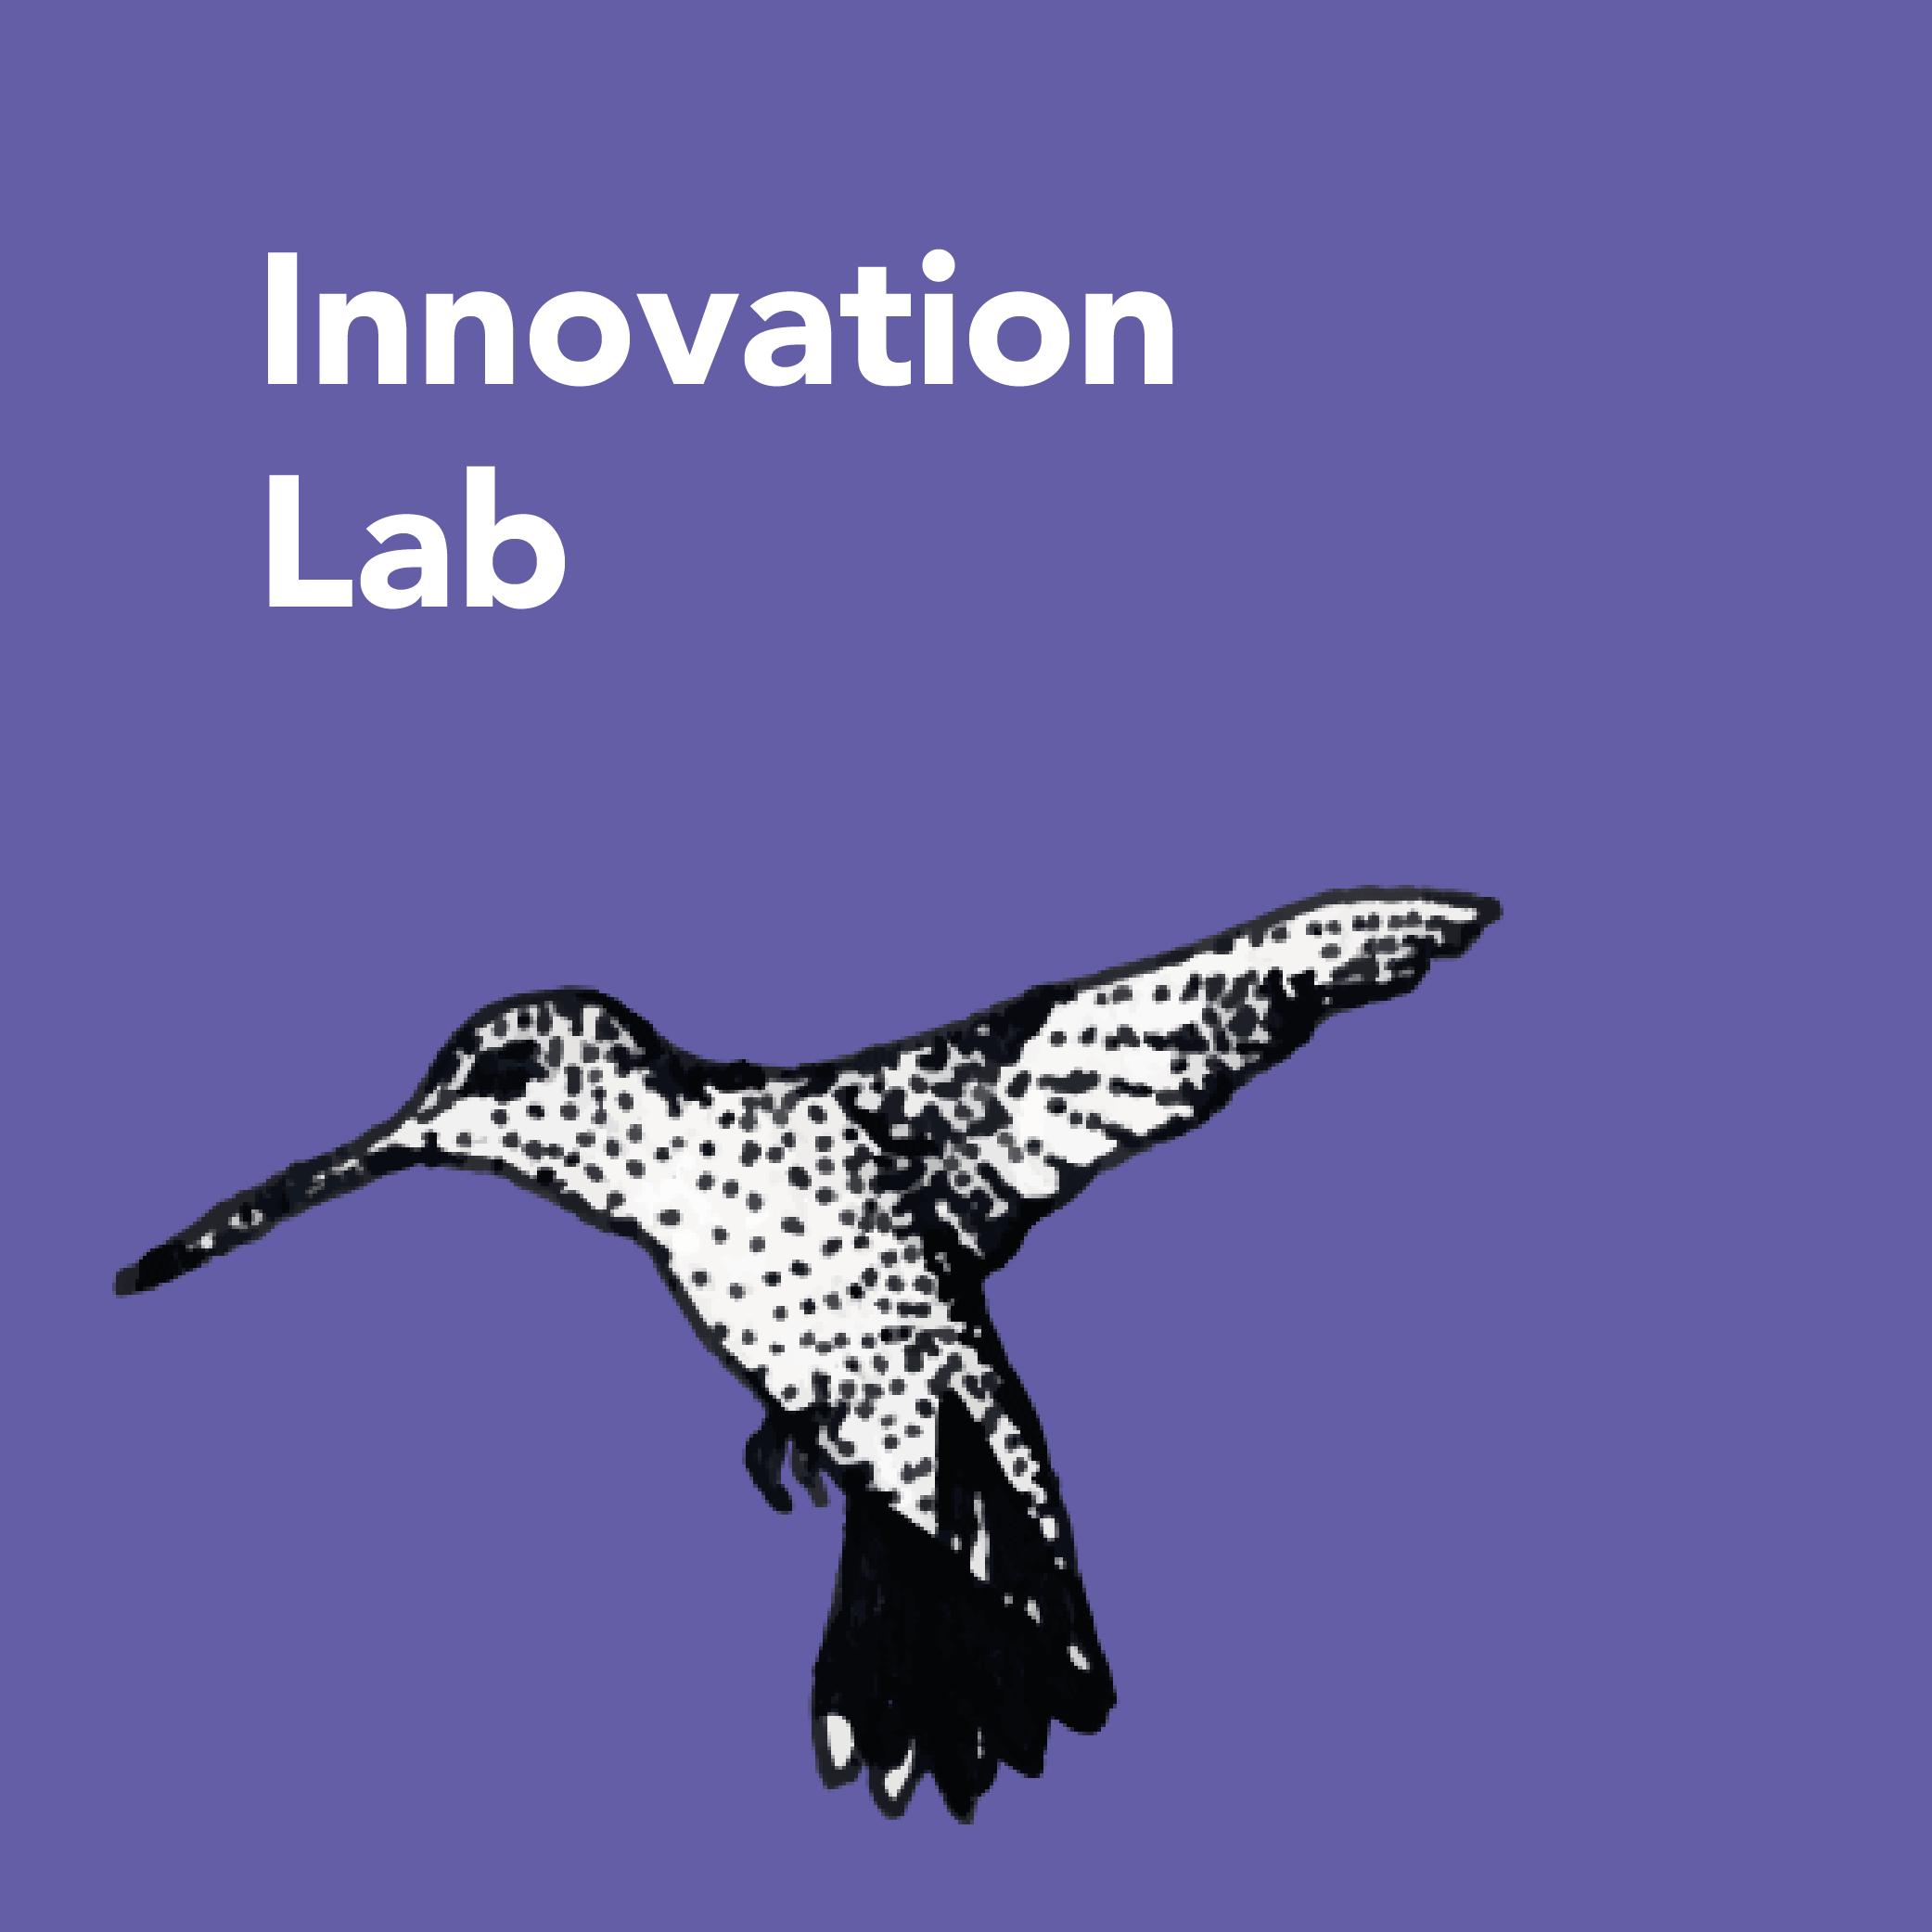 Innovation Lab 500x500